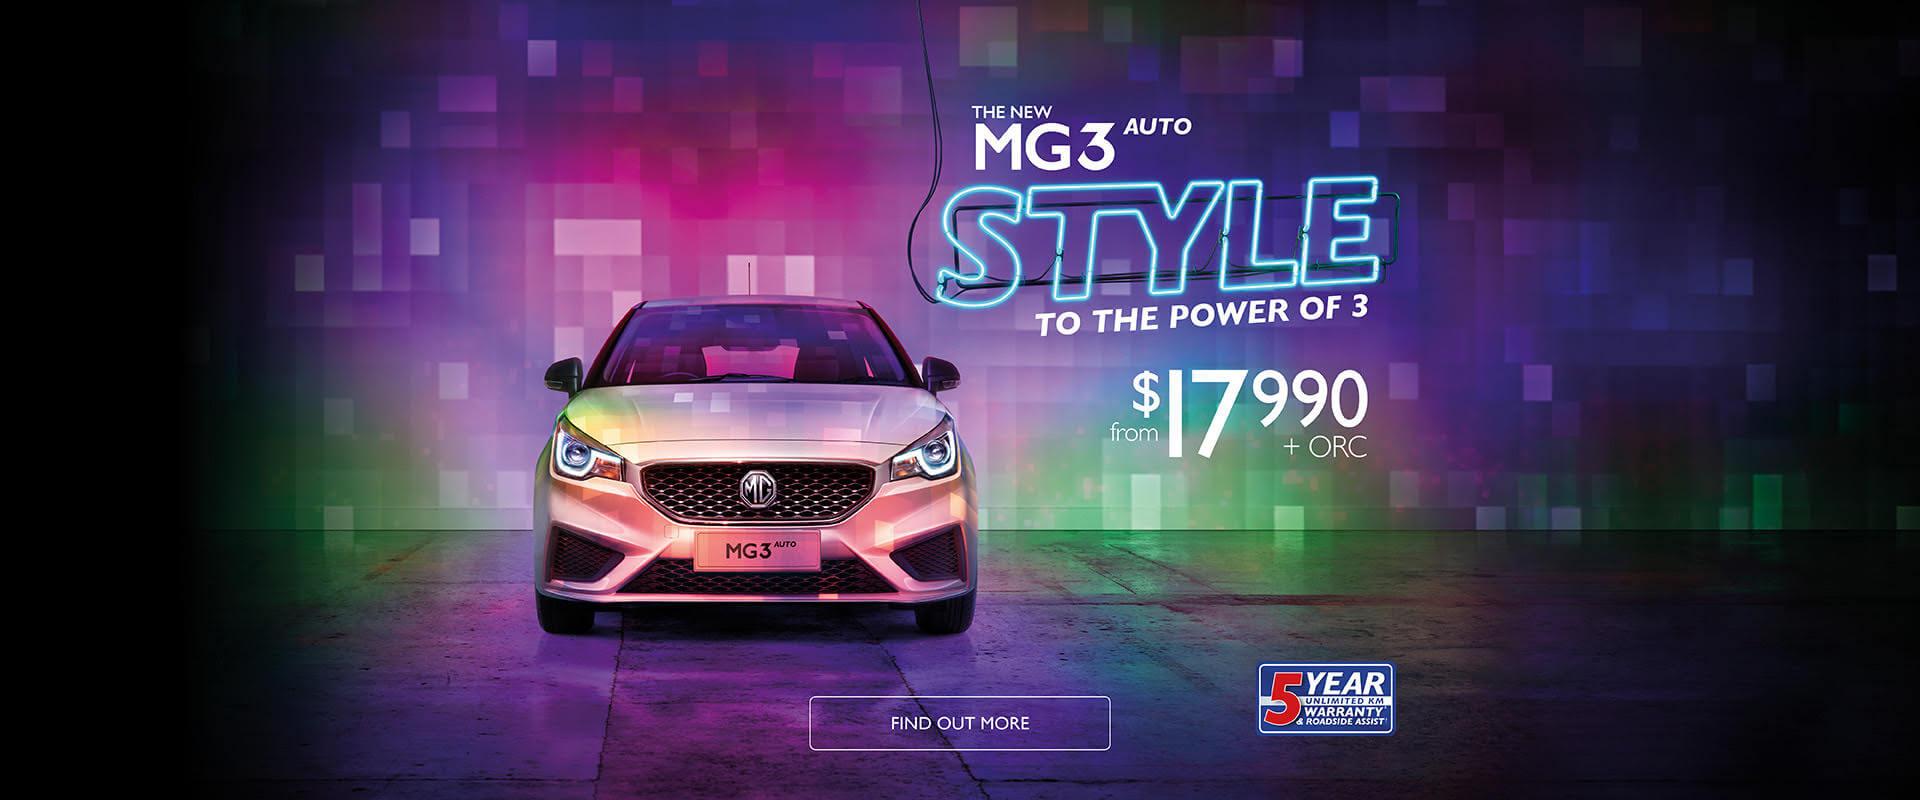 New MG MG3 Auto hatch